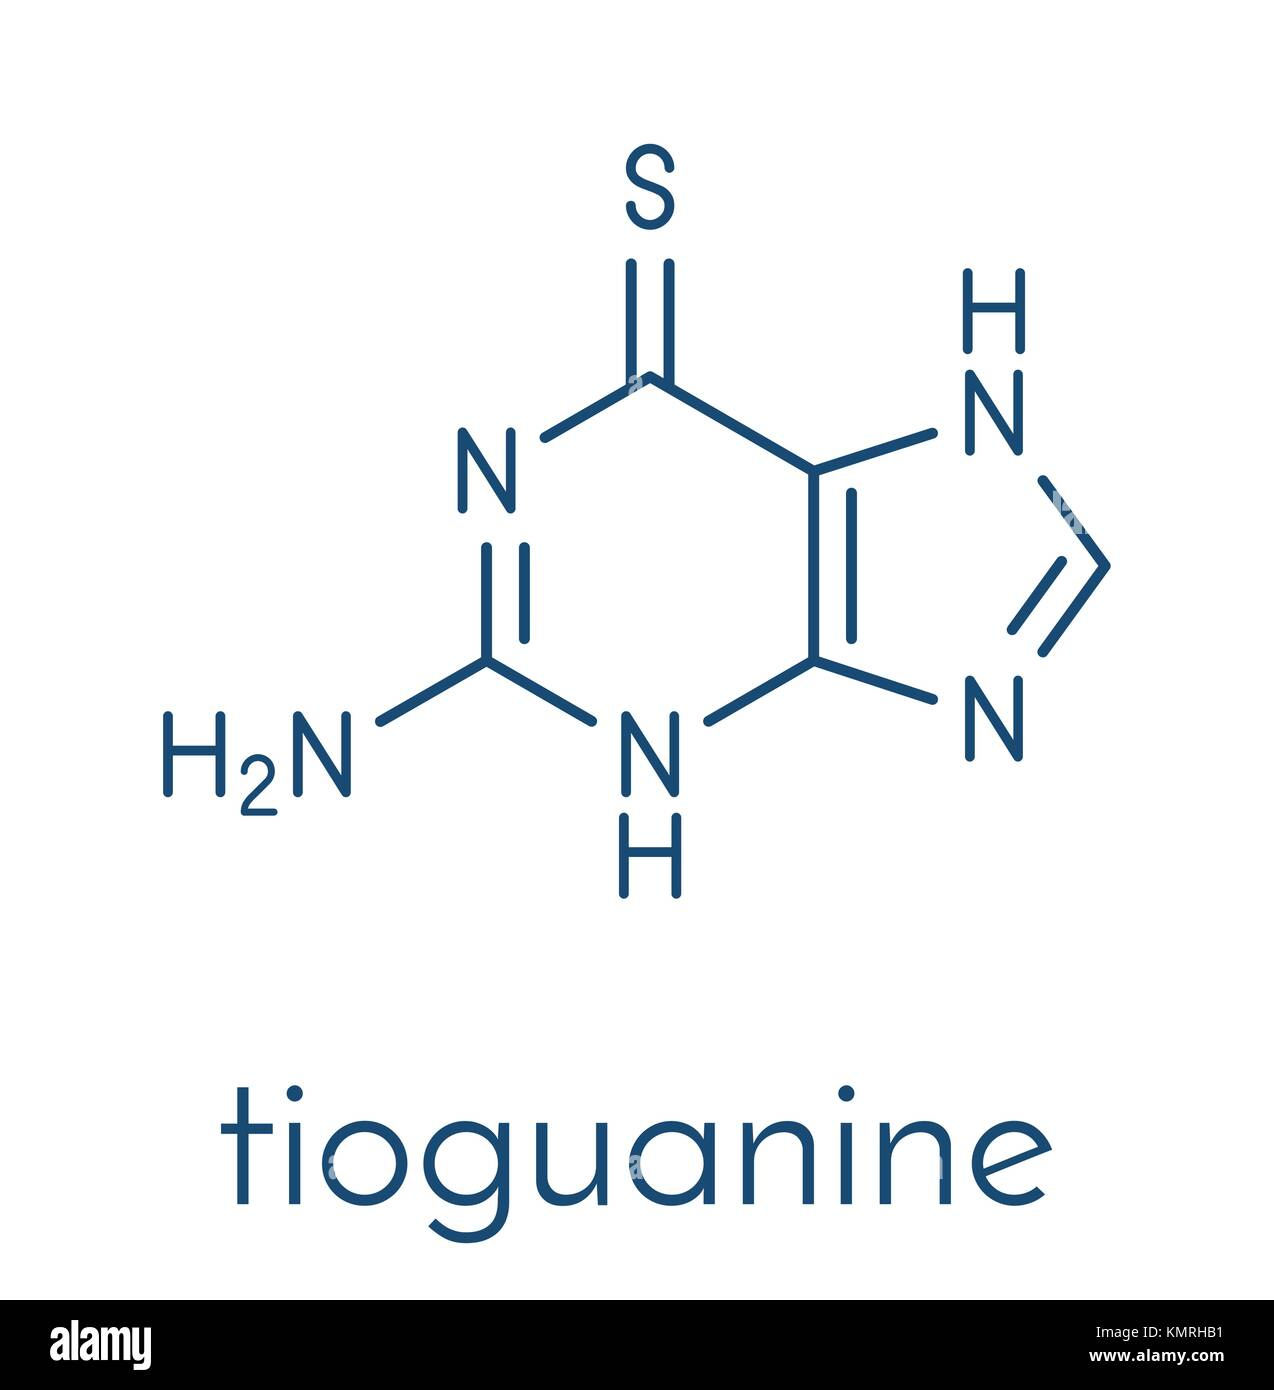 hight resolution of tioguanine leukemia and ulcerative colitis drug molecule skeletal formula stock vector